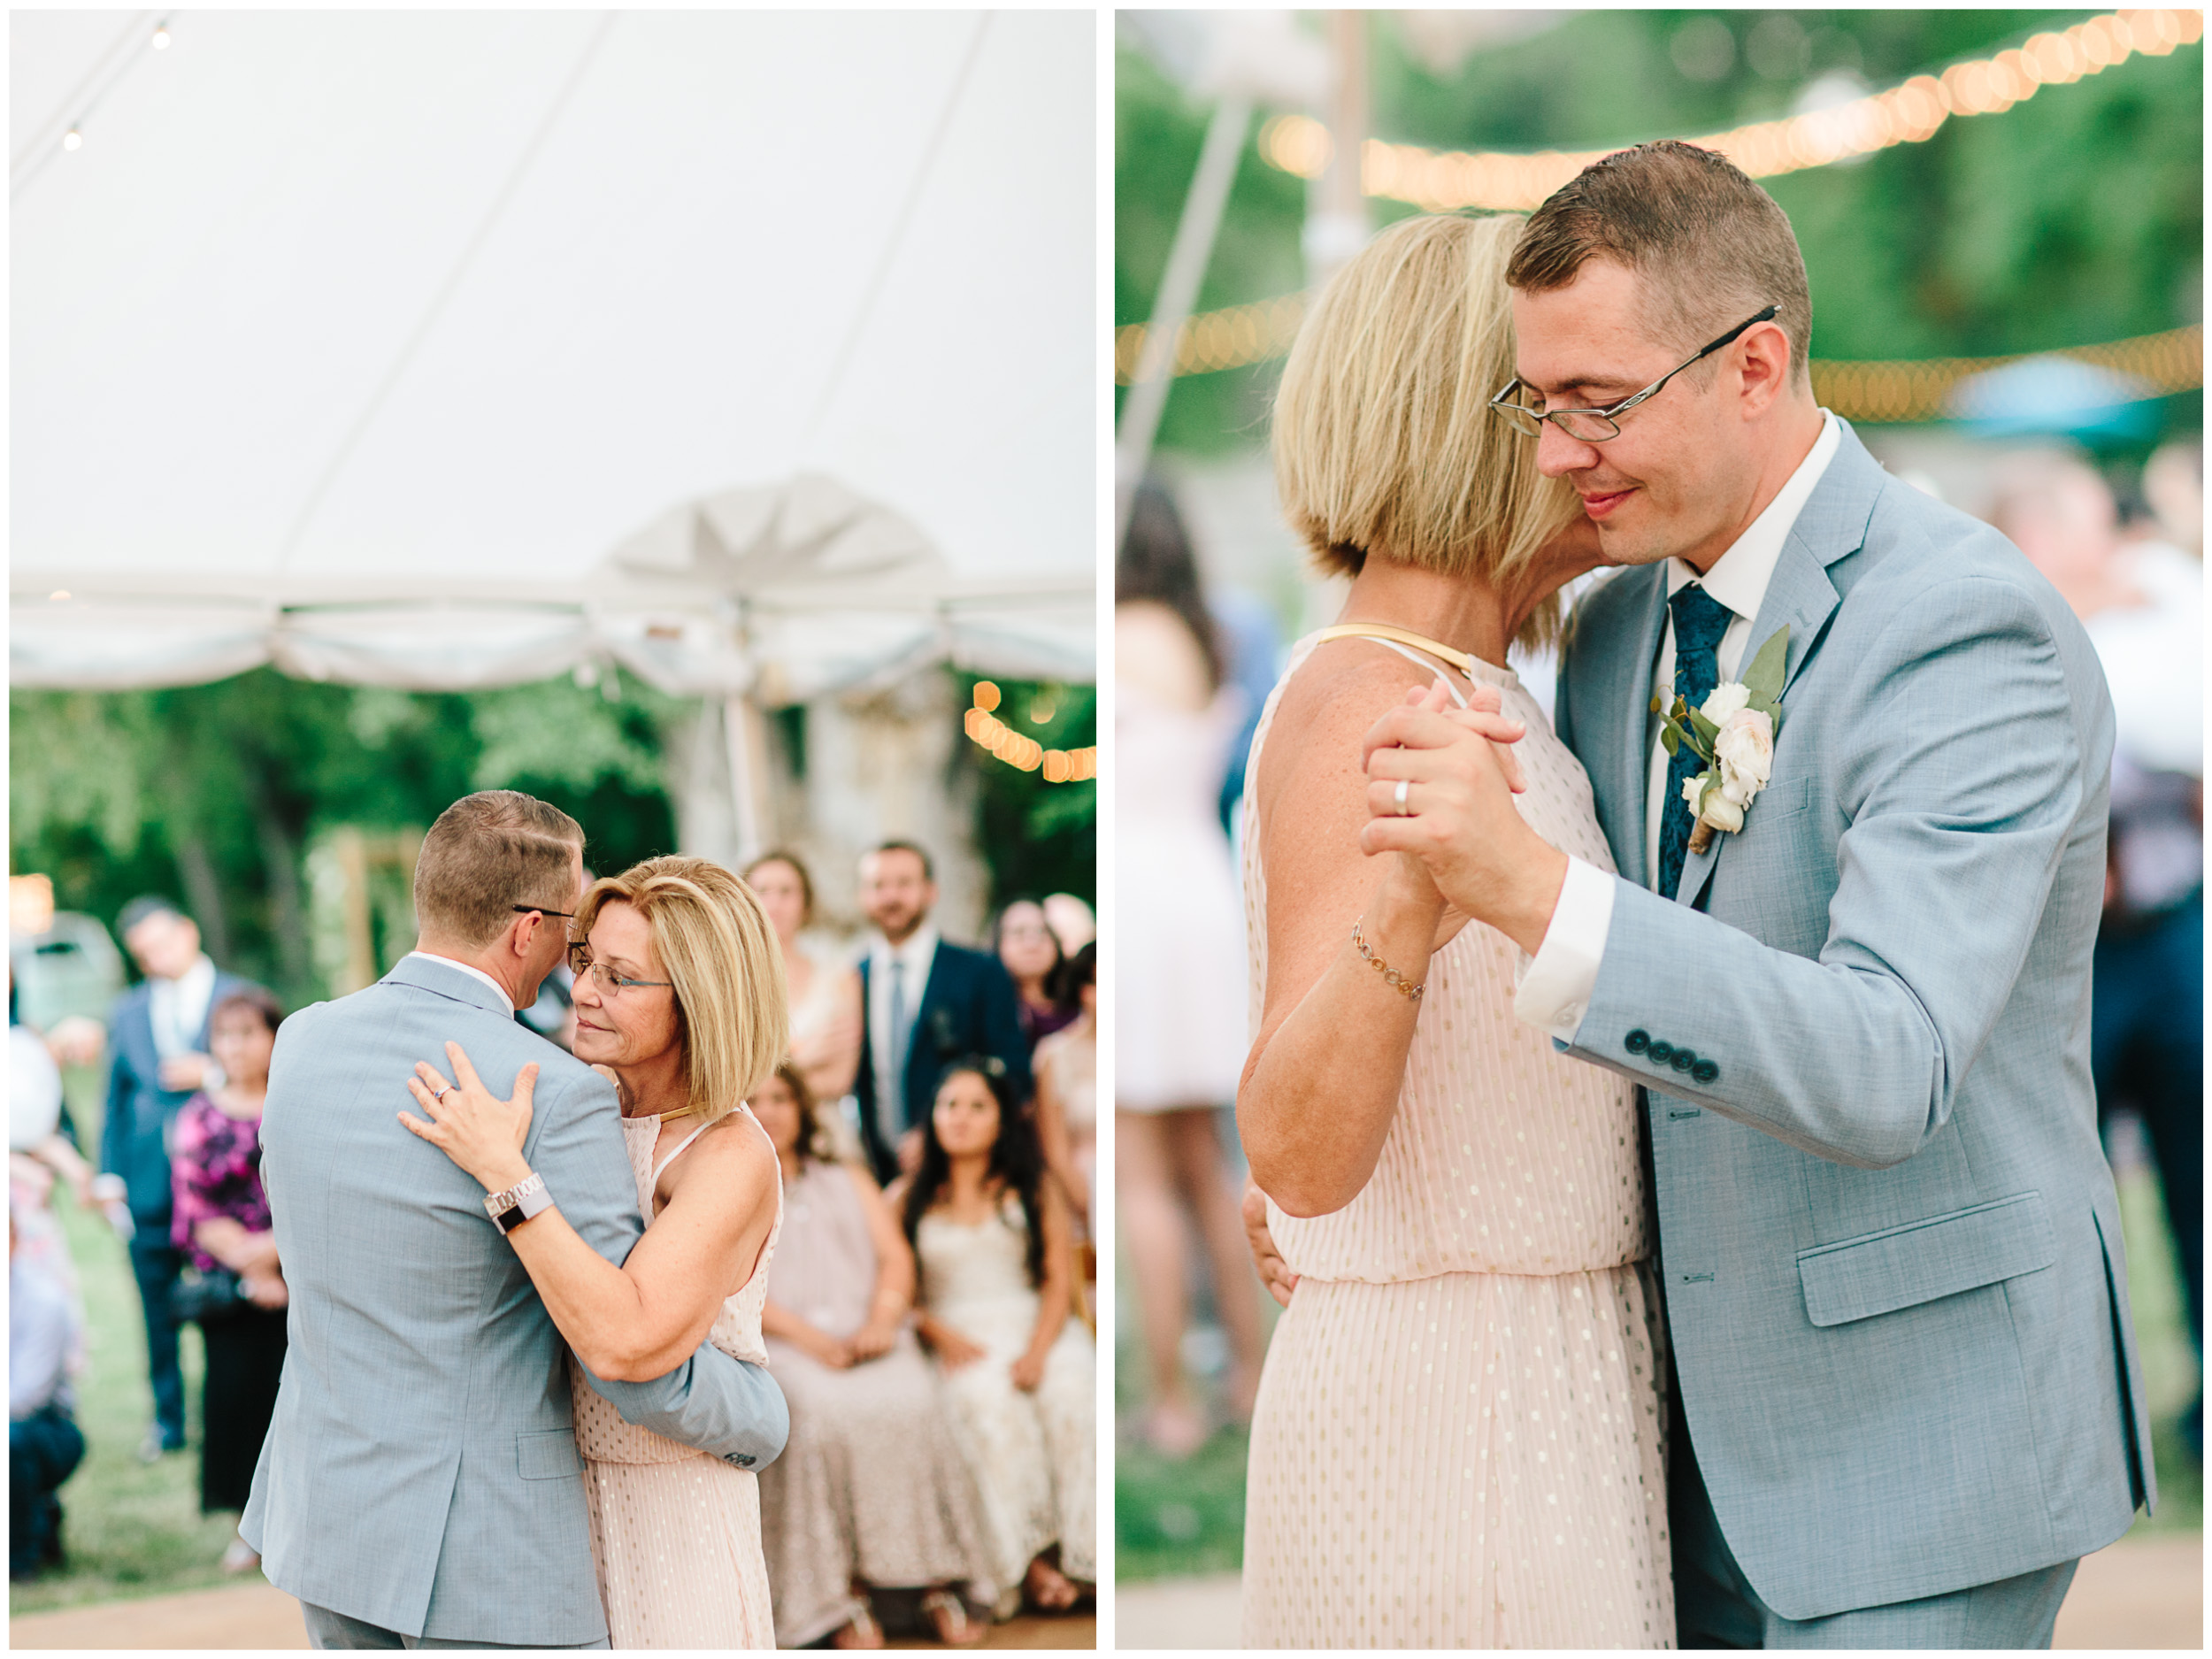 lyons_farmette_wedding_75.jpg